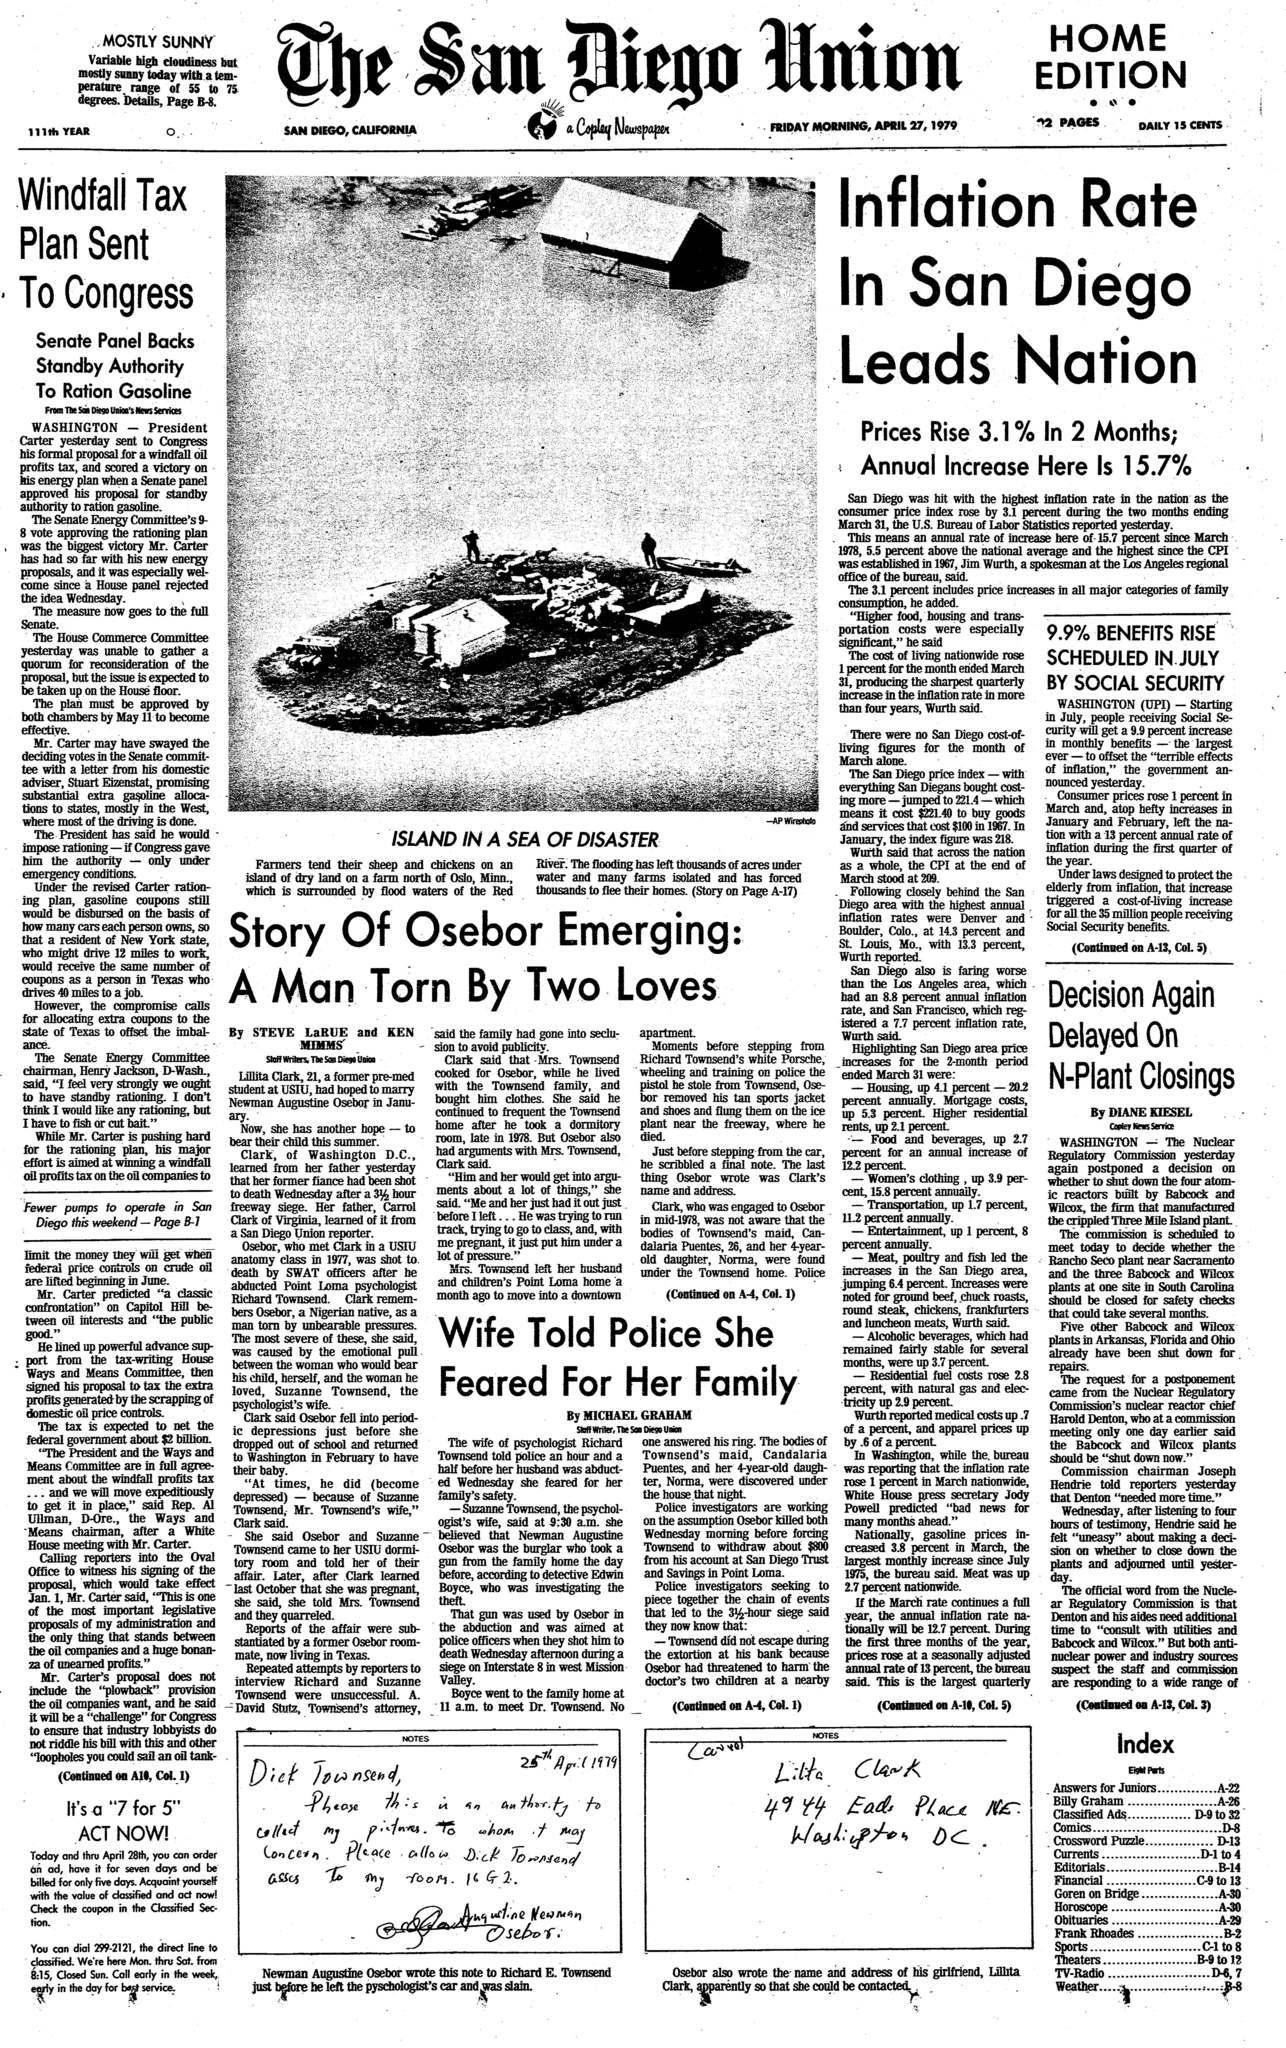 April 27, 1989